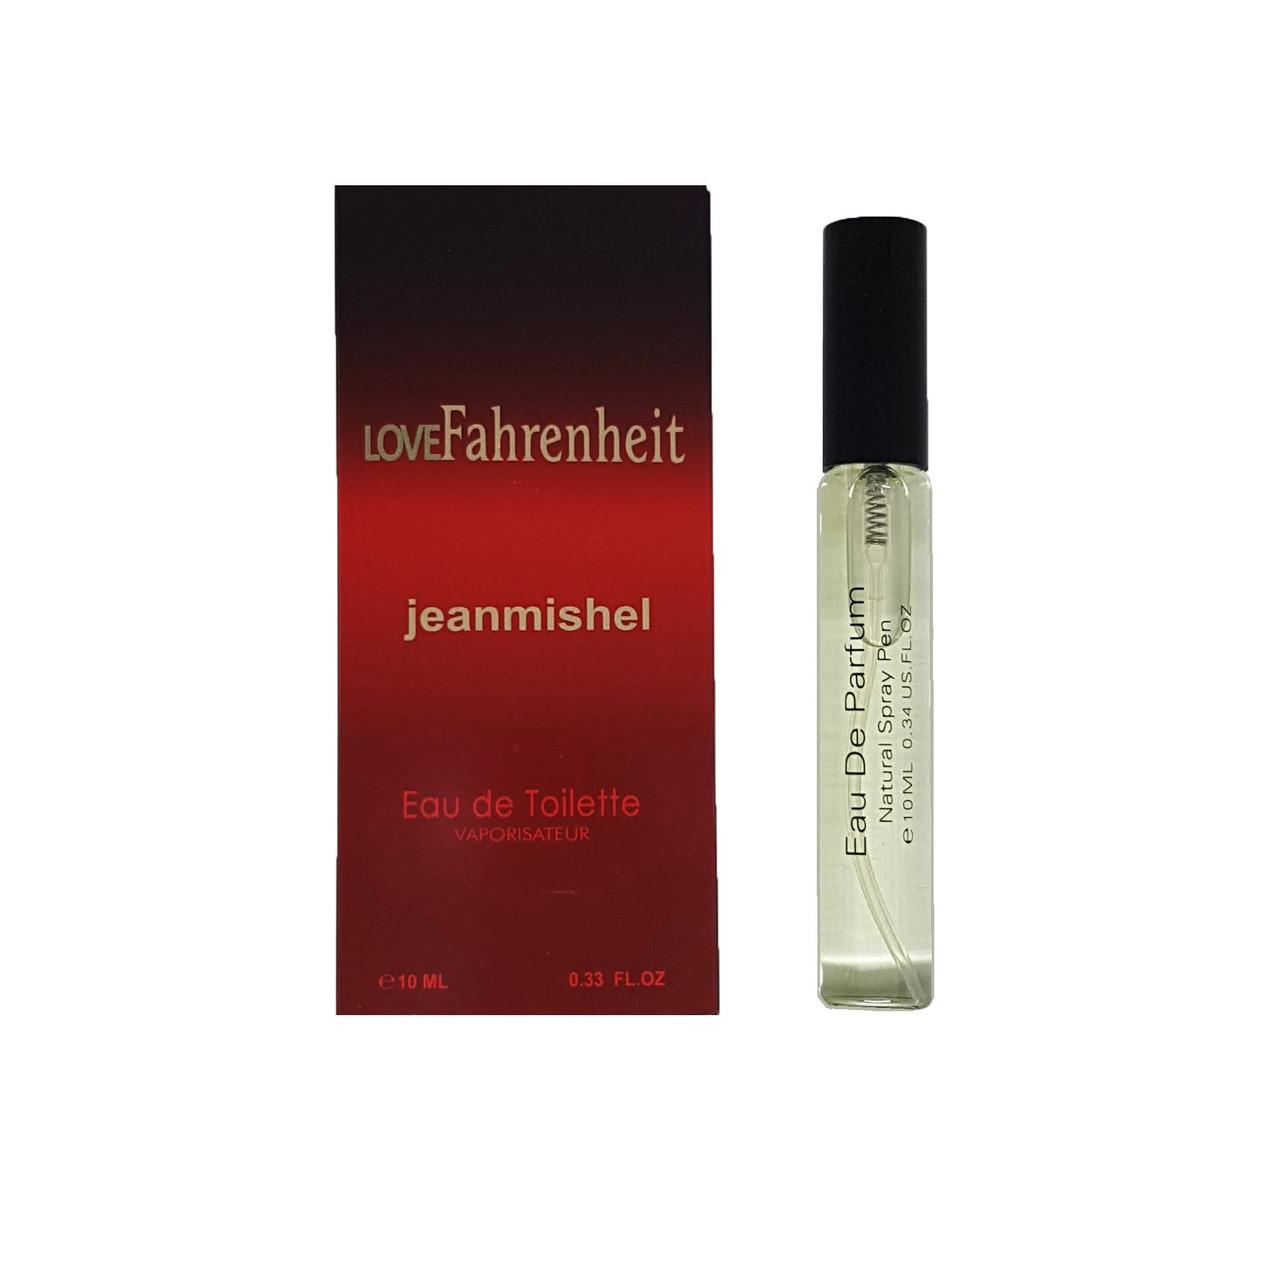 Jeanmishel Love Faronheit (24) 10ml